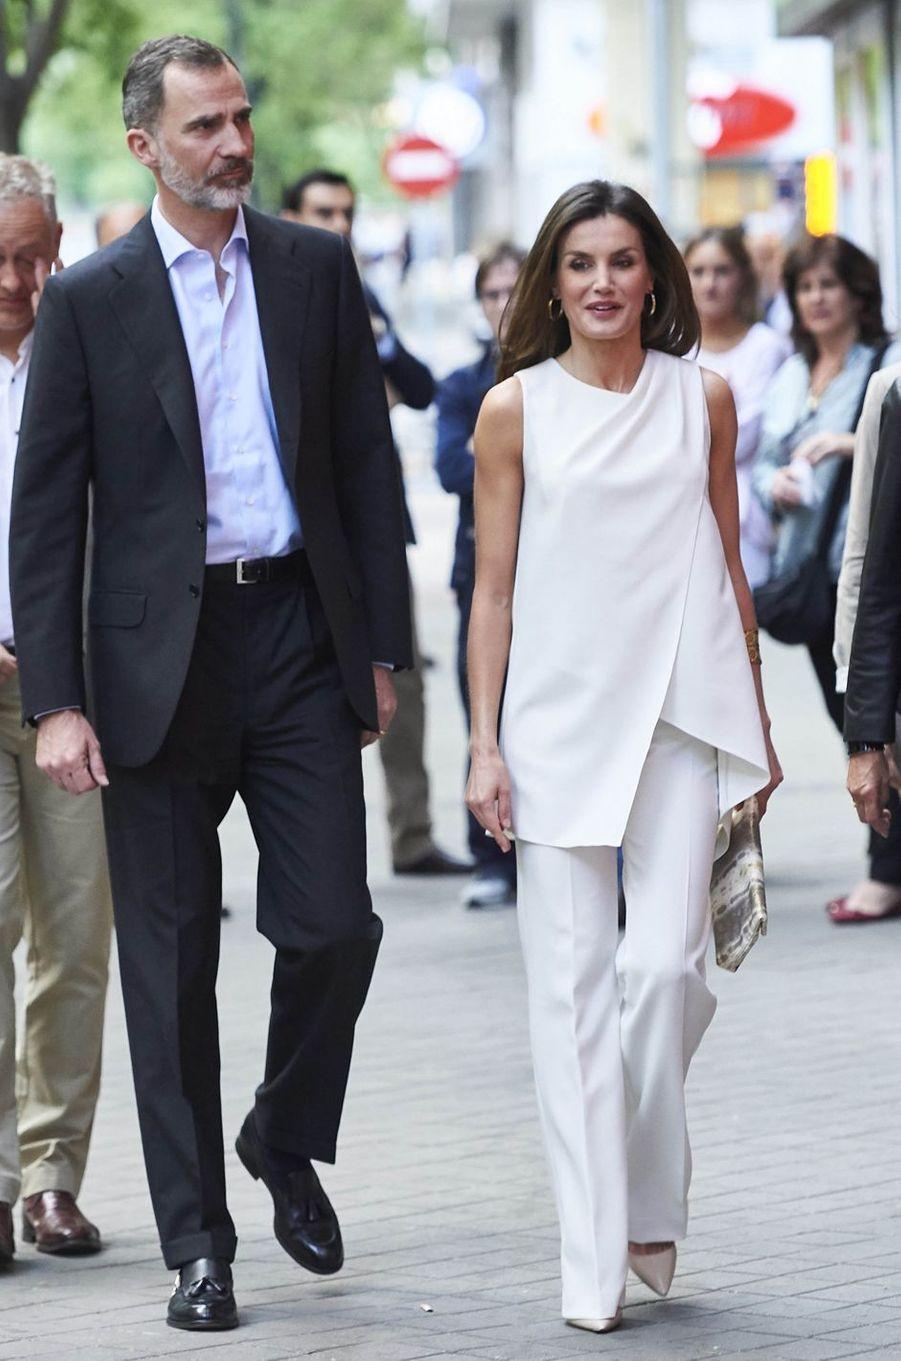 La reine Letizia d'Espagne en Pedro del Hierro, le 17 mai 2018